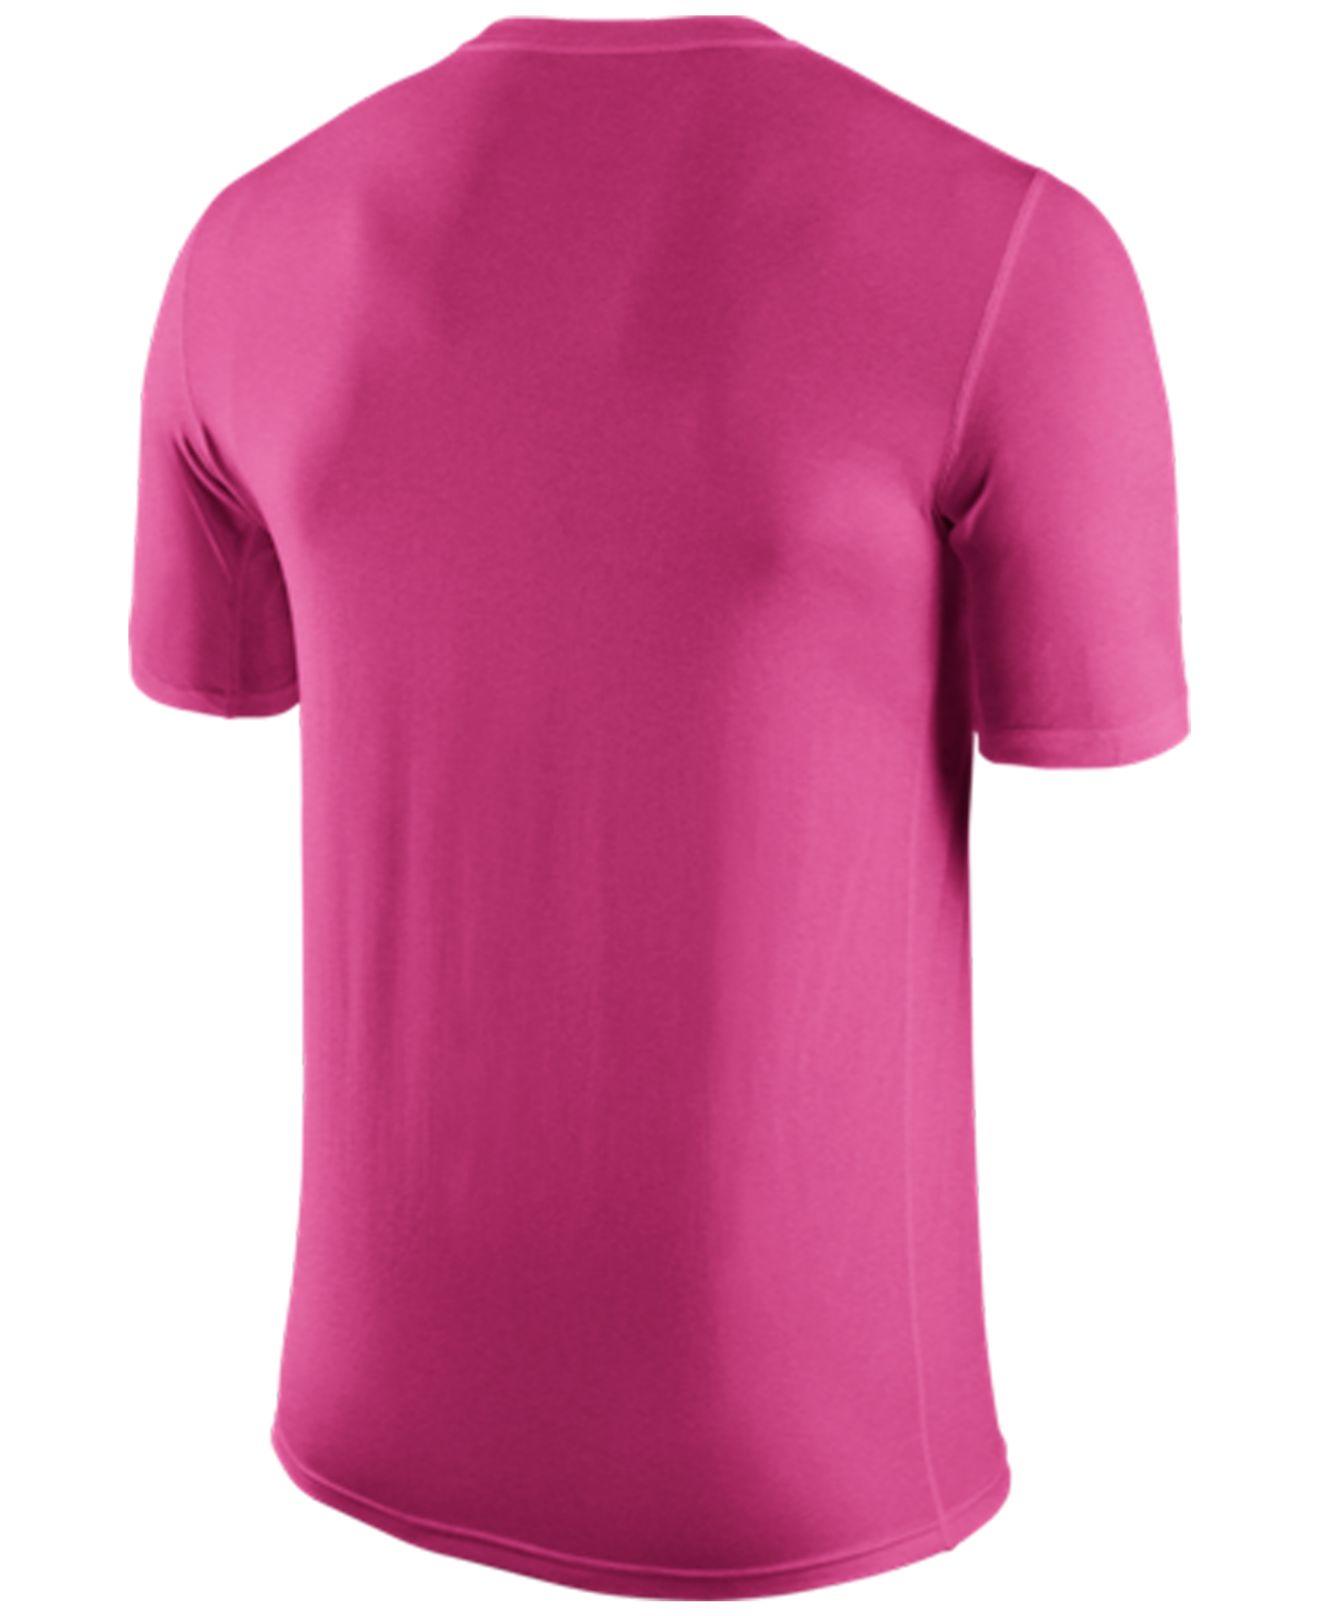 Mens Breast Cancer Awareness Shirts